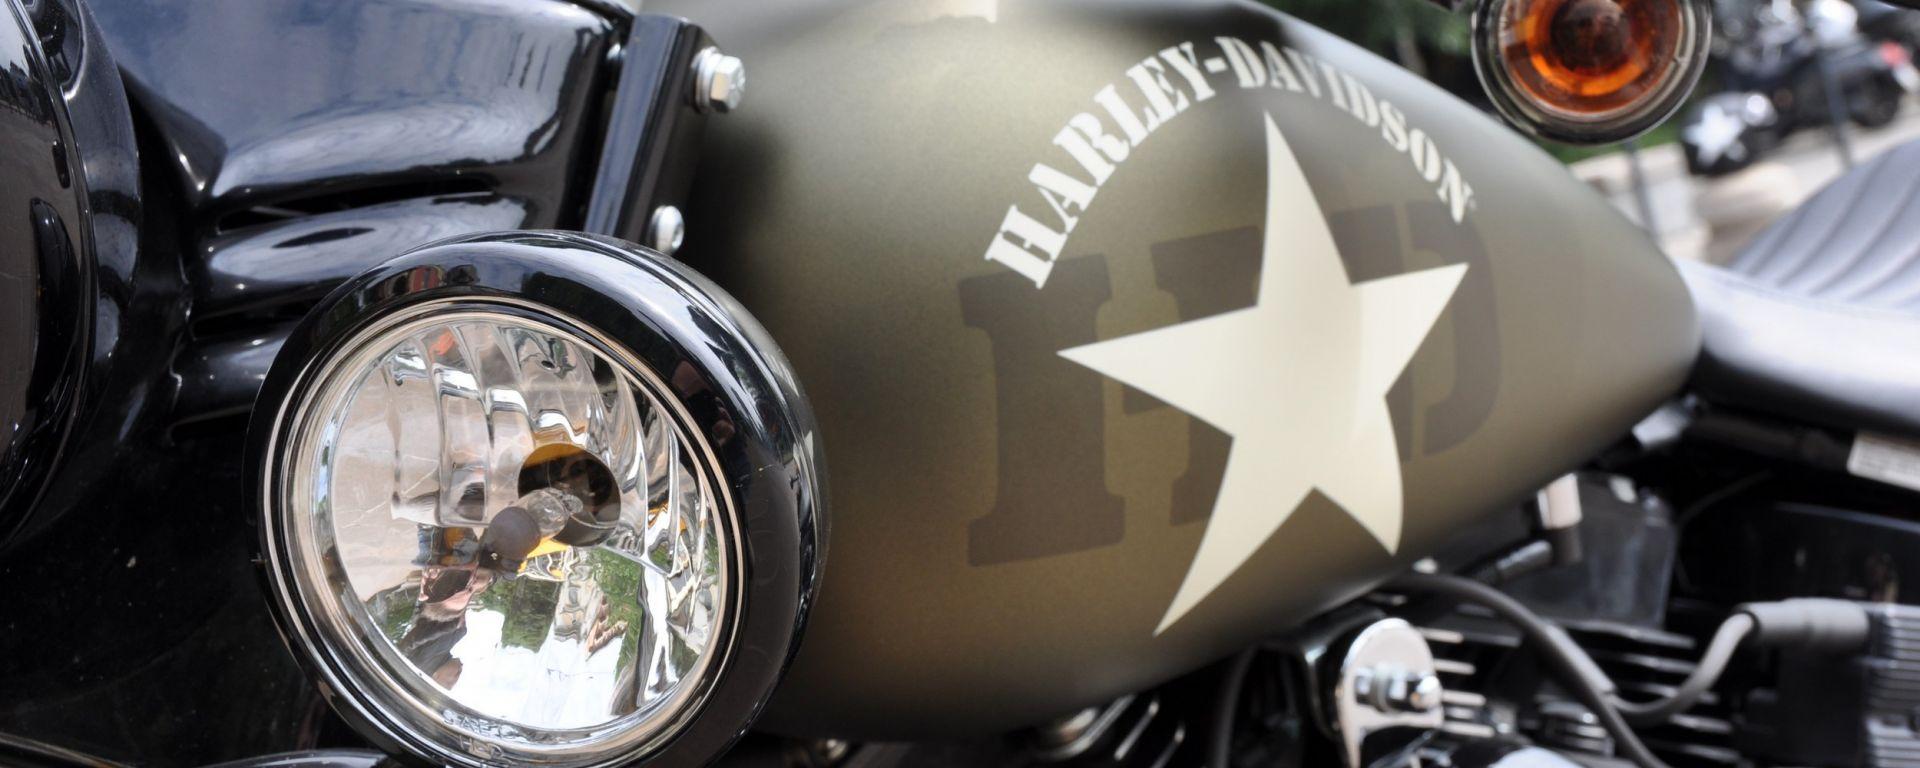 Harley-Davidson: arriva l'assistenza stradale